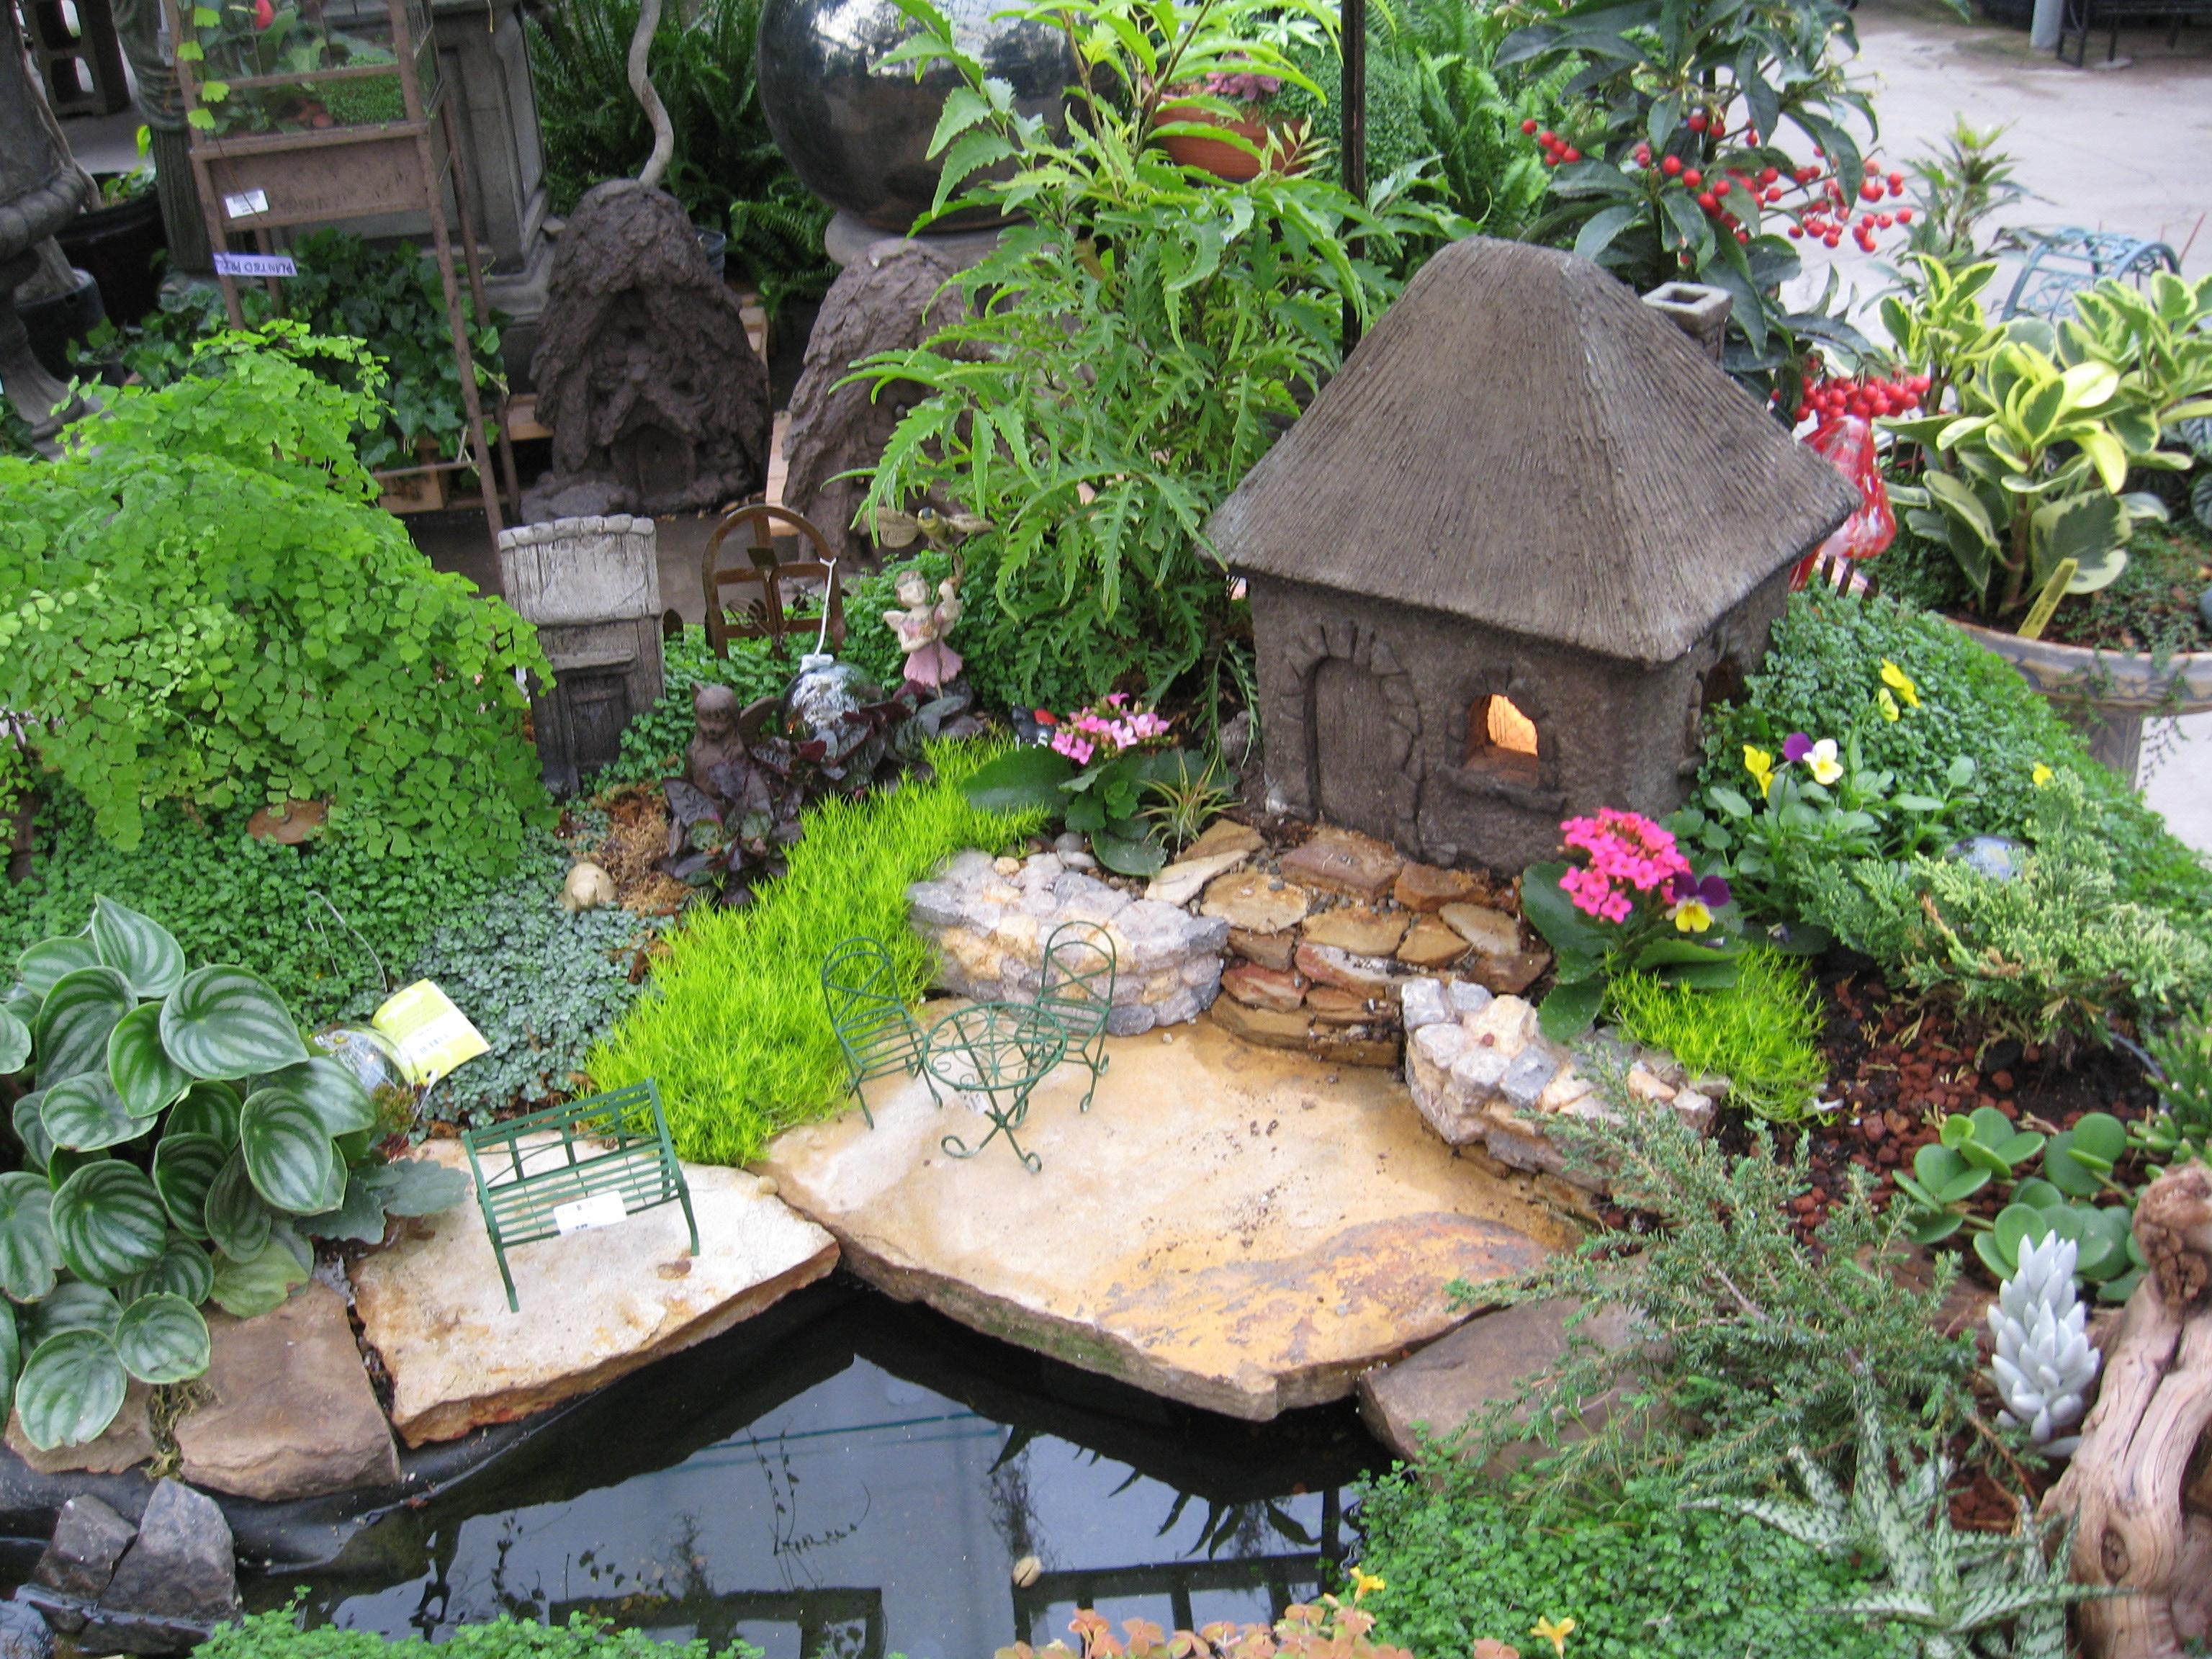 Garden Supplies 05